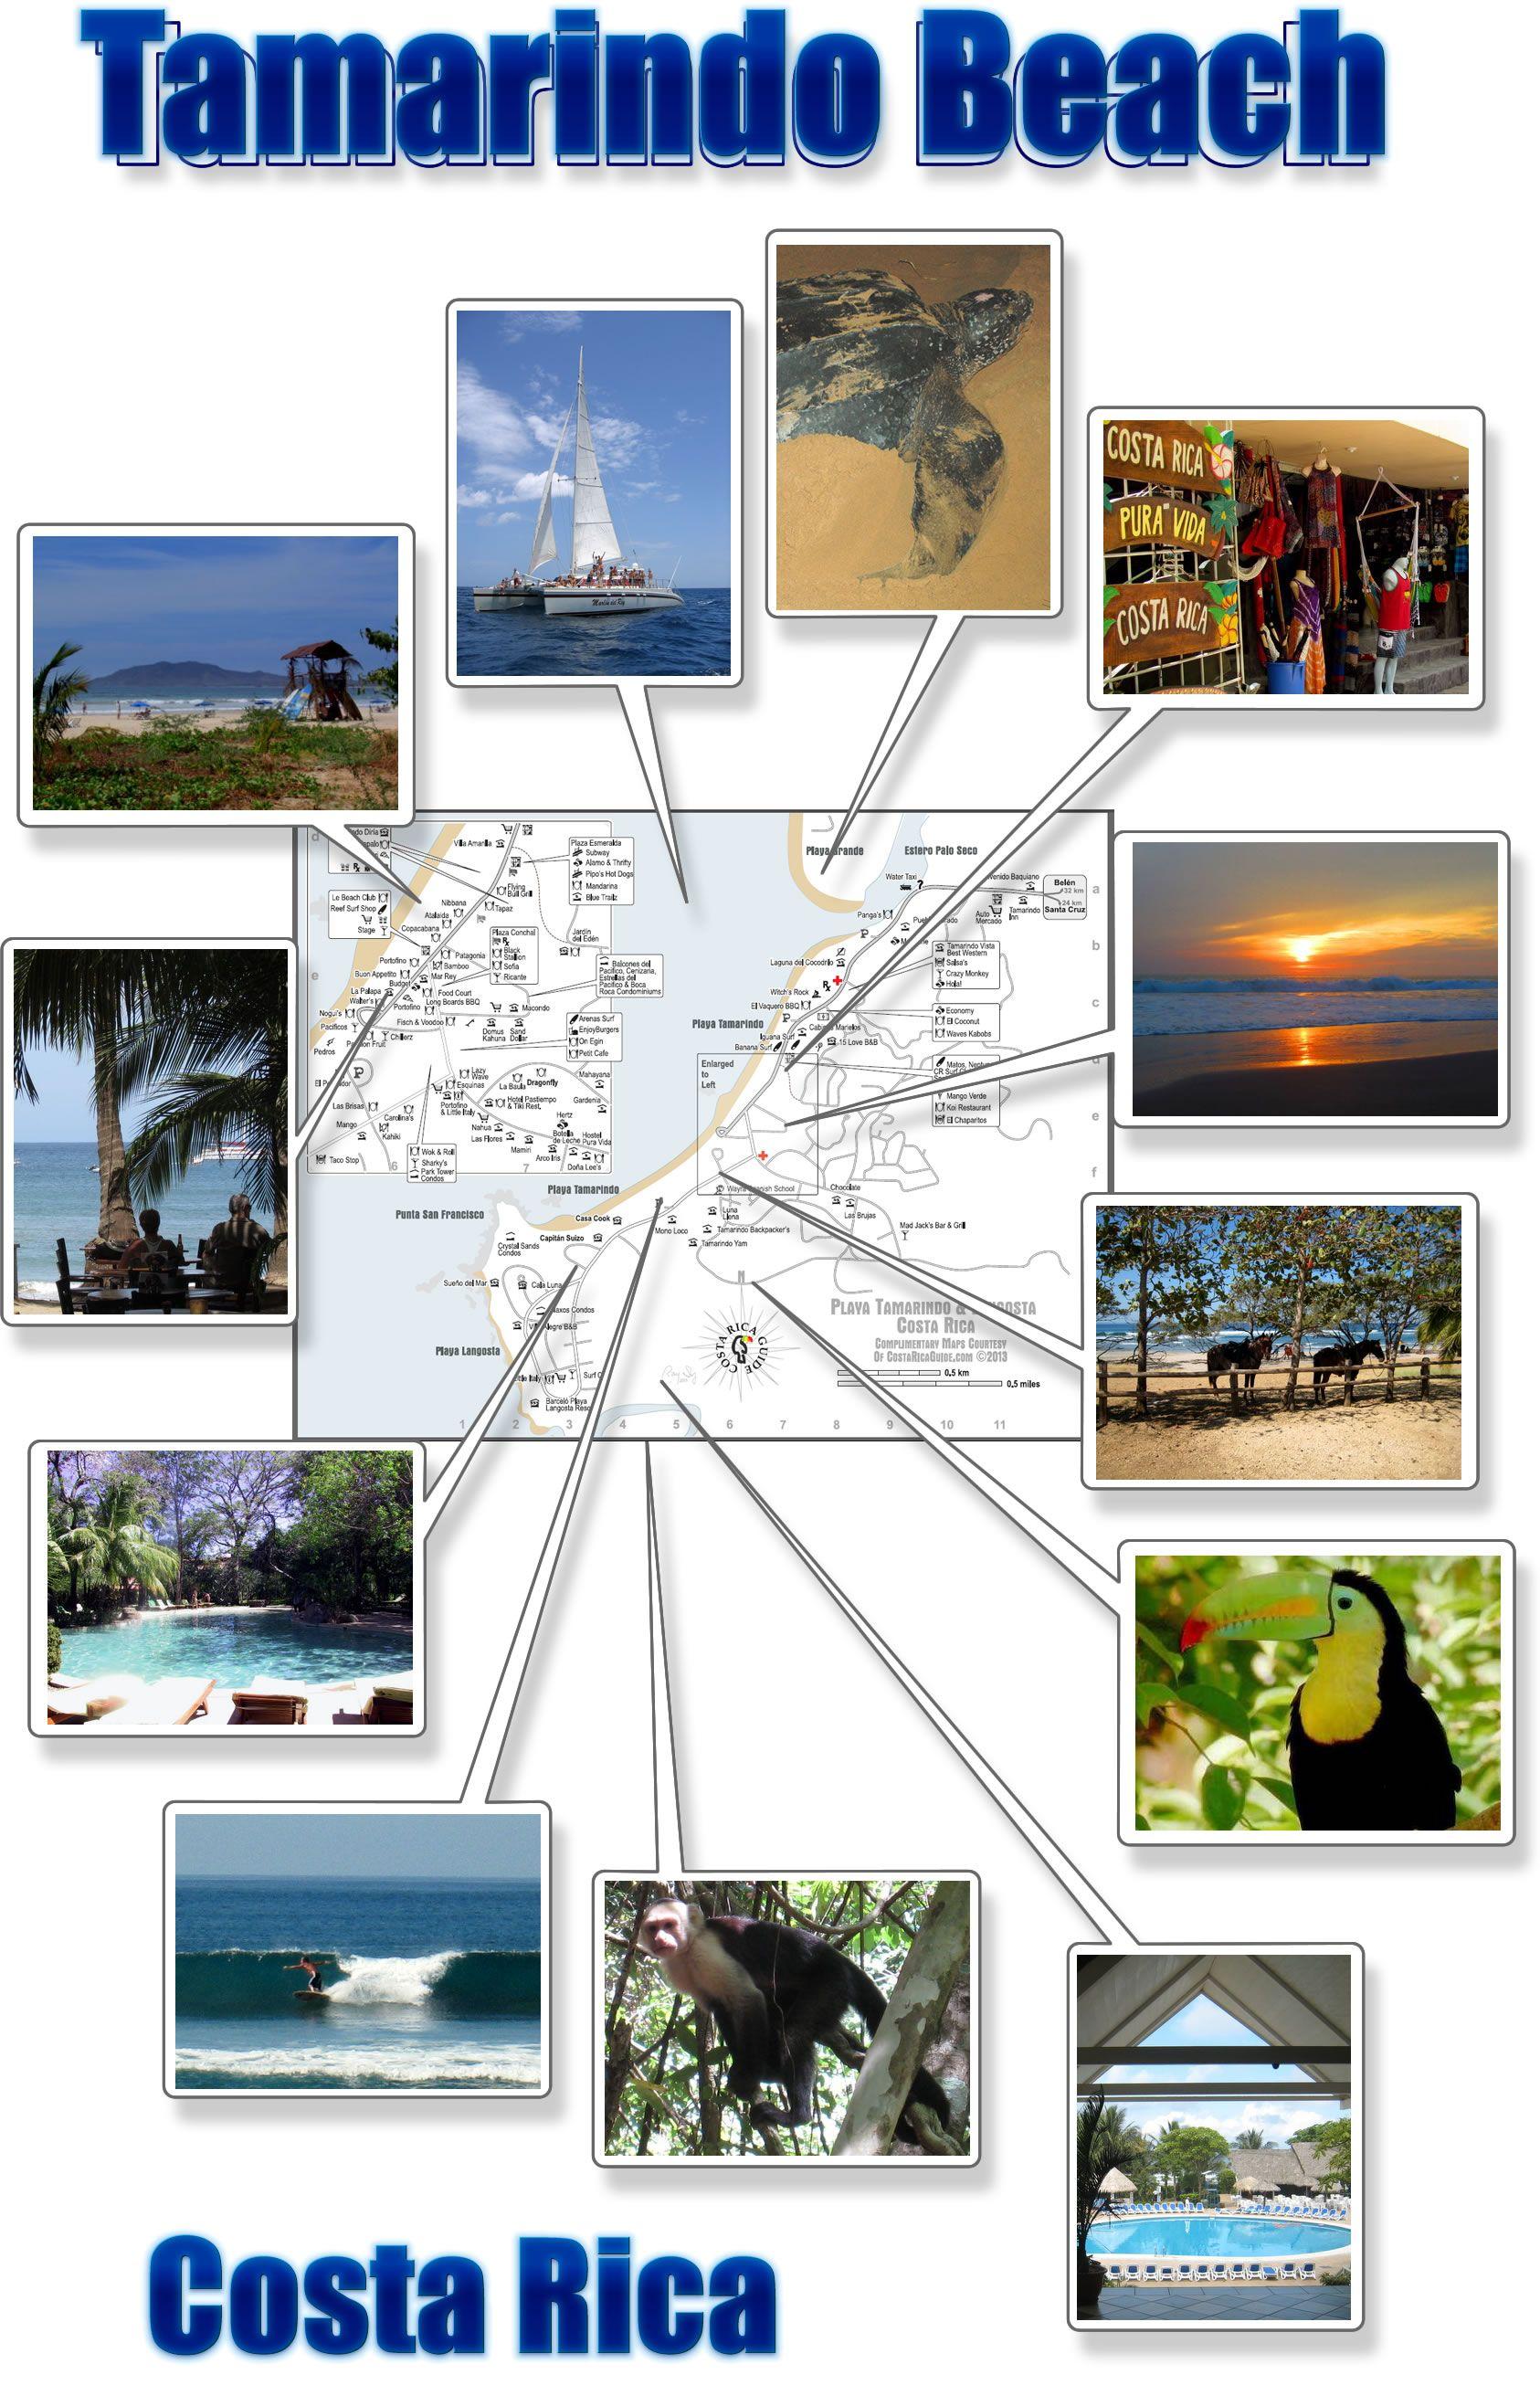 playa tamarindo costa rica map Tamarindo Beach Map Free Printable Download Including playa tamarindo costa rica map